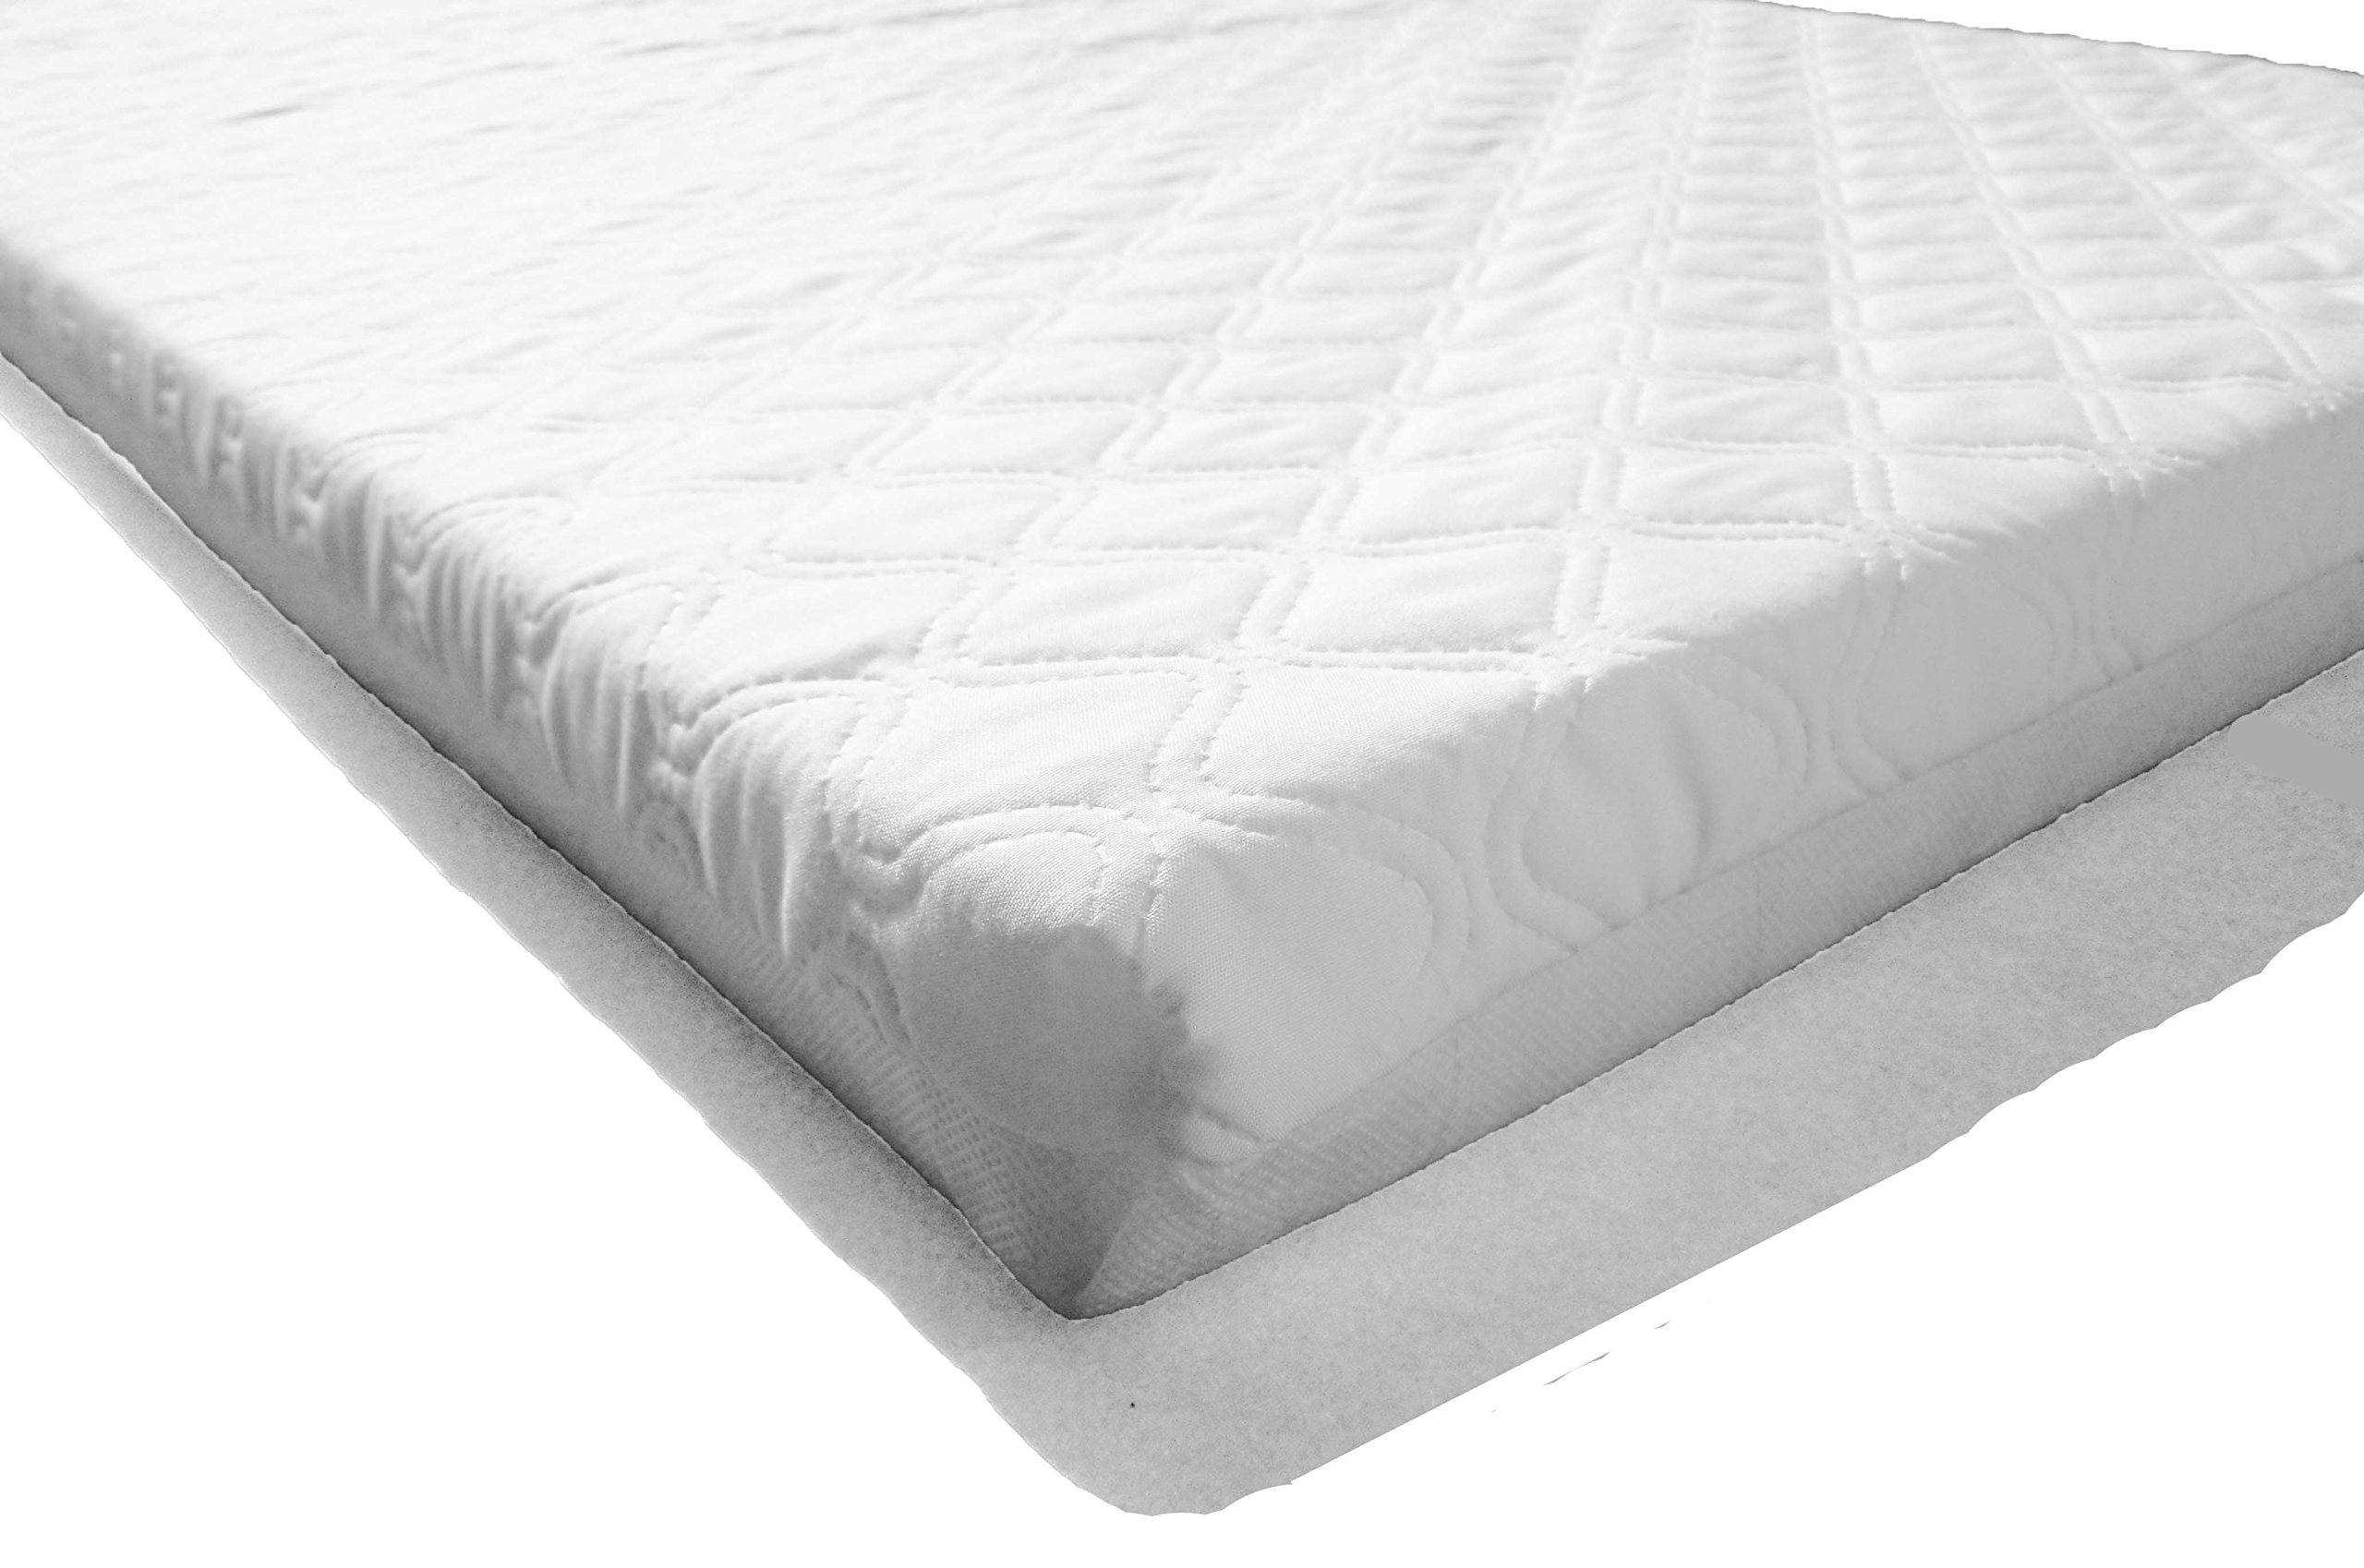 British Made With High Grade Density Foam CMHR28 LAURA 119x59cm Baby Travel Cot Mattress